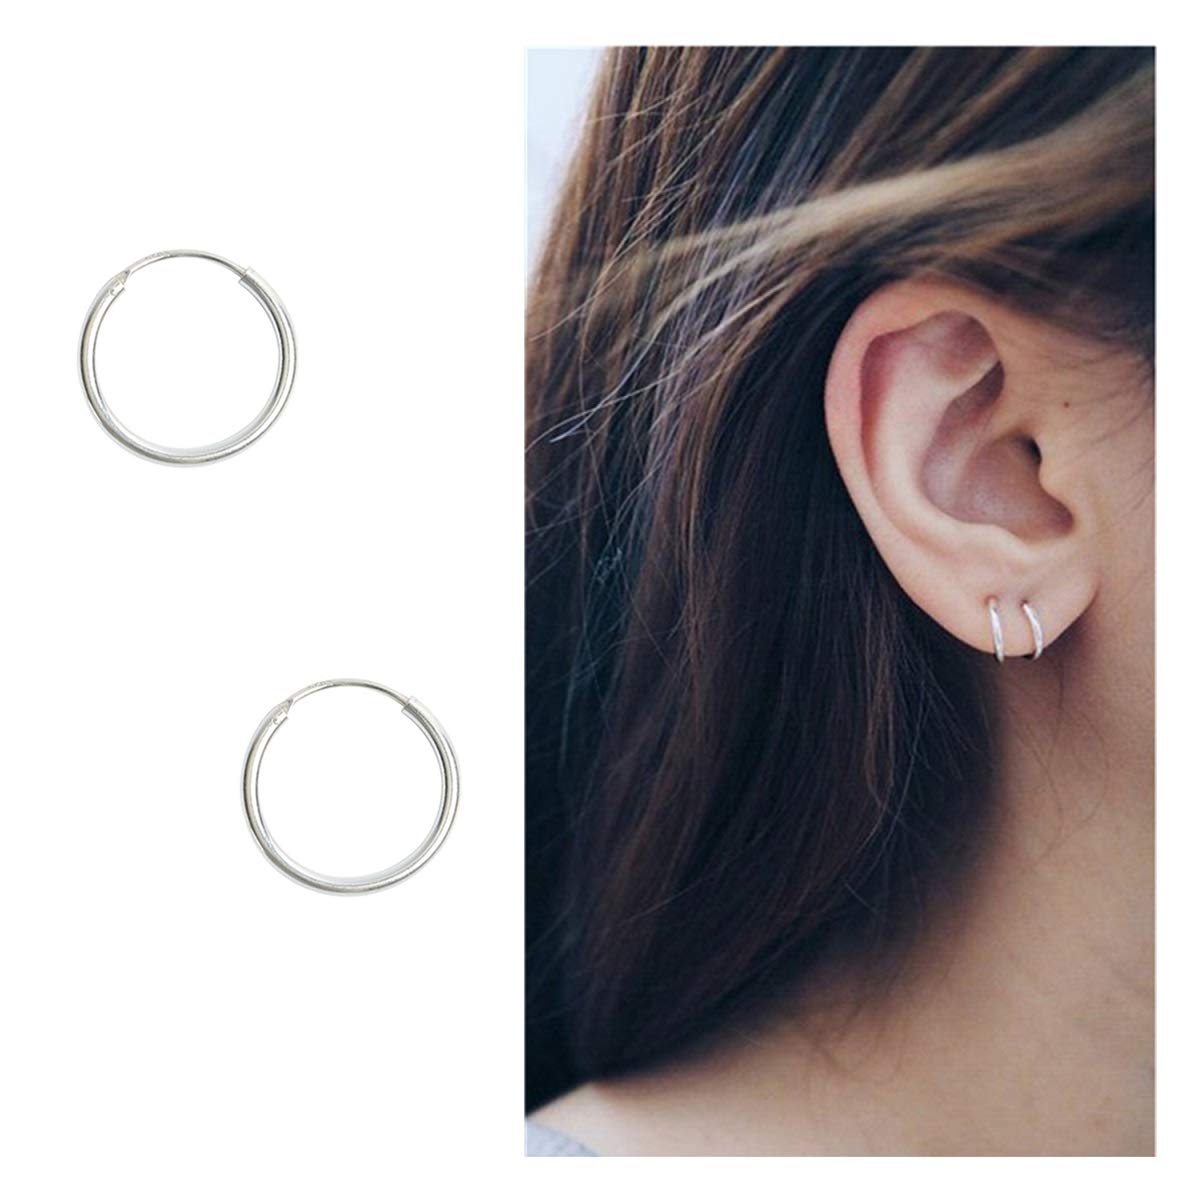 Sterling Silver Hoop Earrings Cartilage Piercing Earring Small Round Set For Women Men Girls